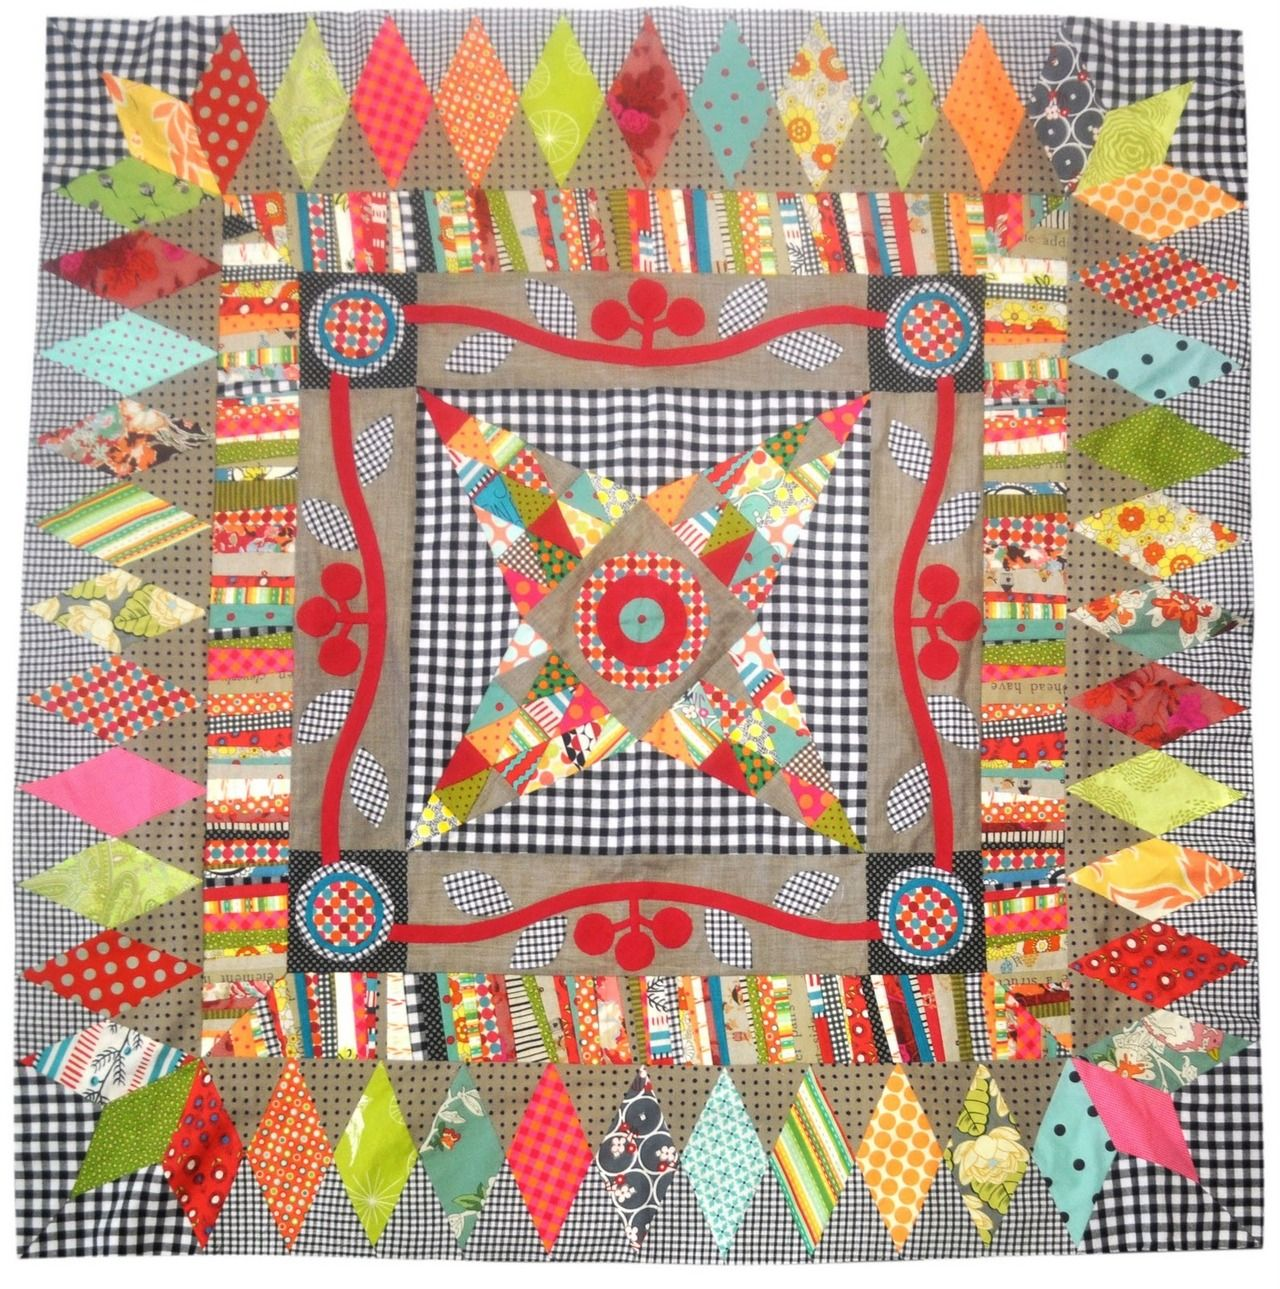 createcreatively: Border 4 by Judy Newman.